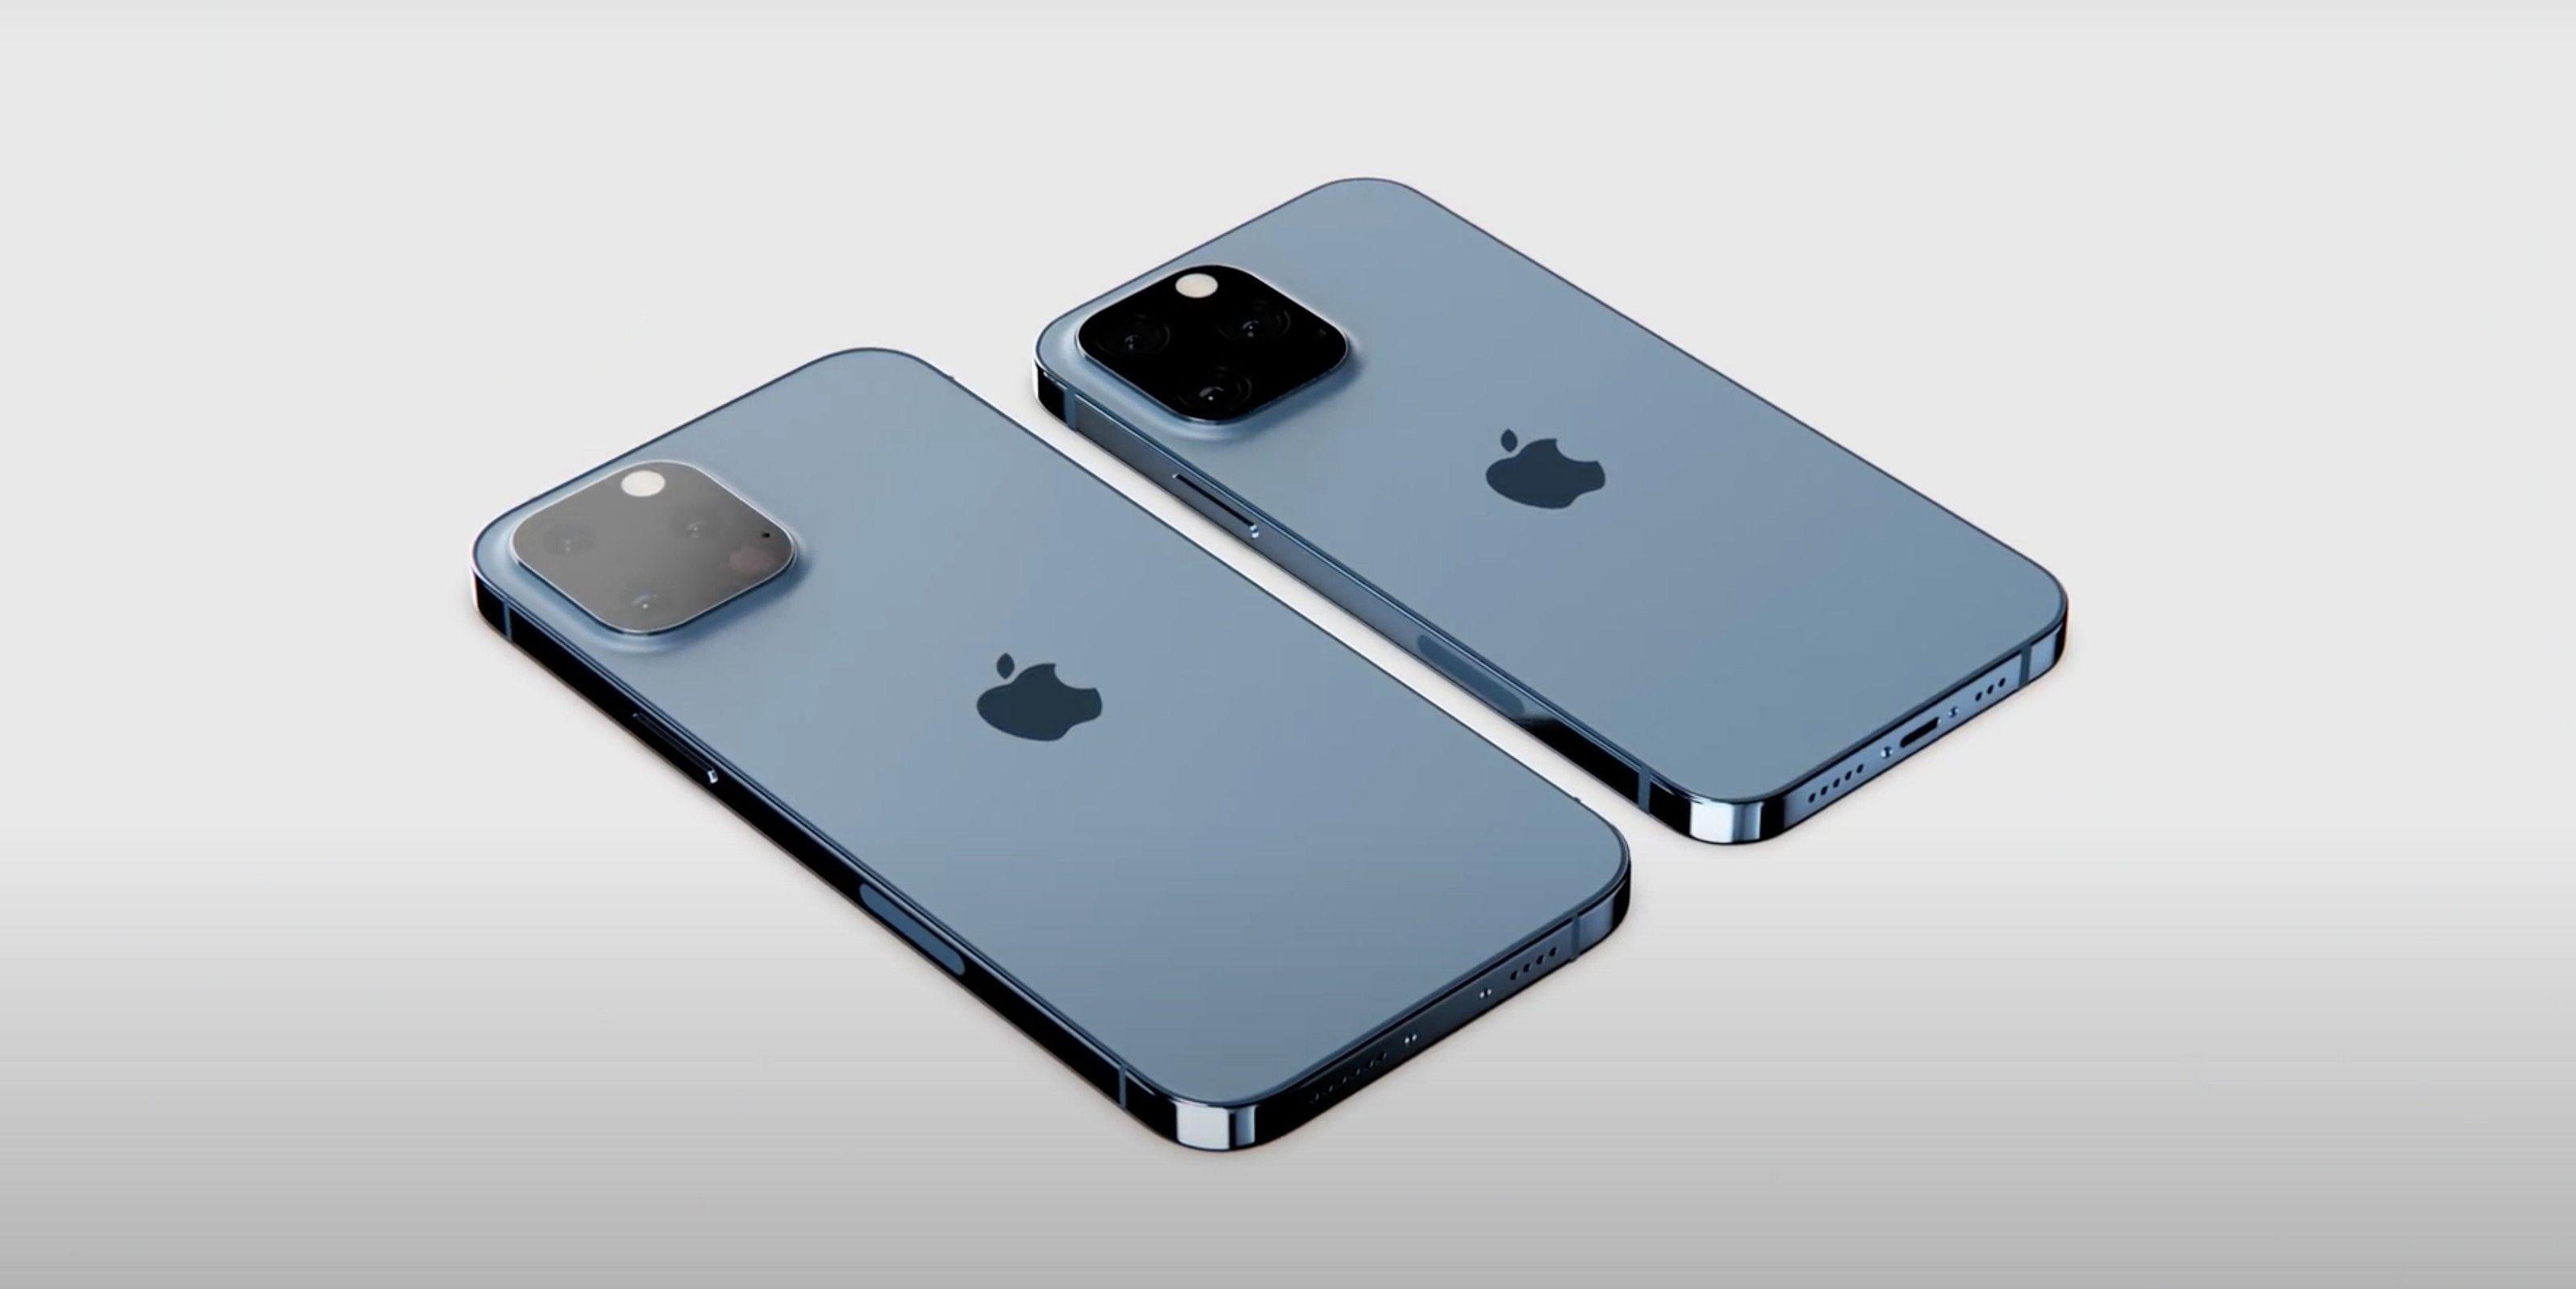 iPhone 13: Features, Design, Preis – das kommt 2021 - Macwelt